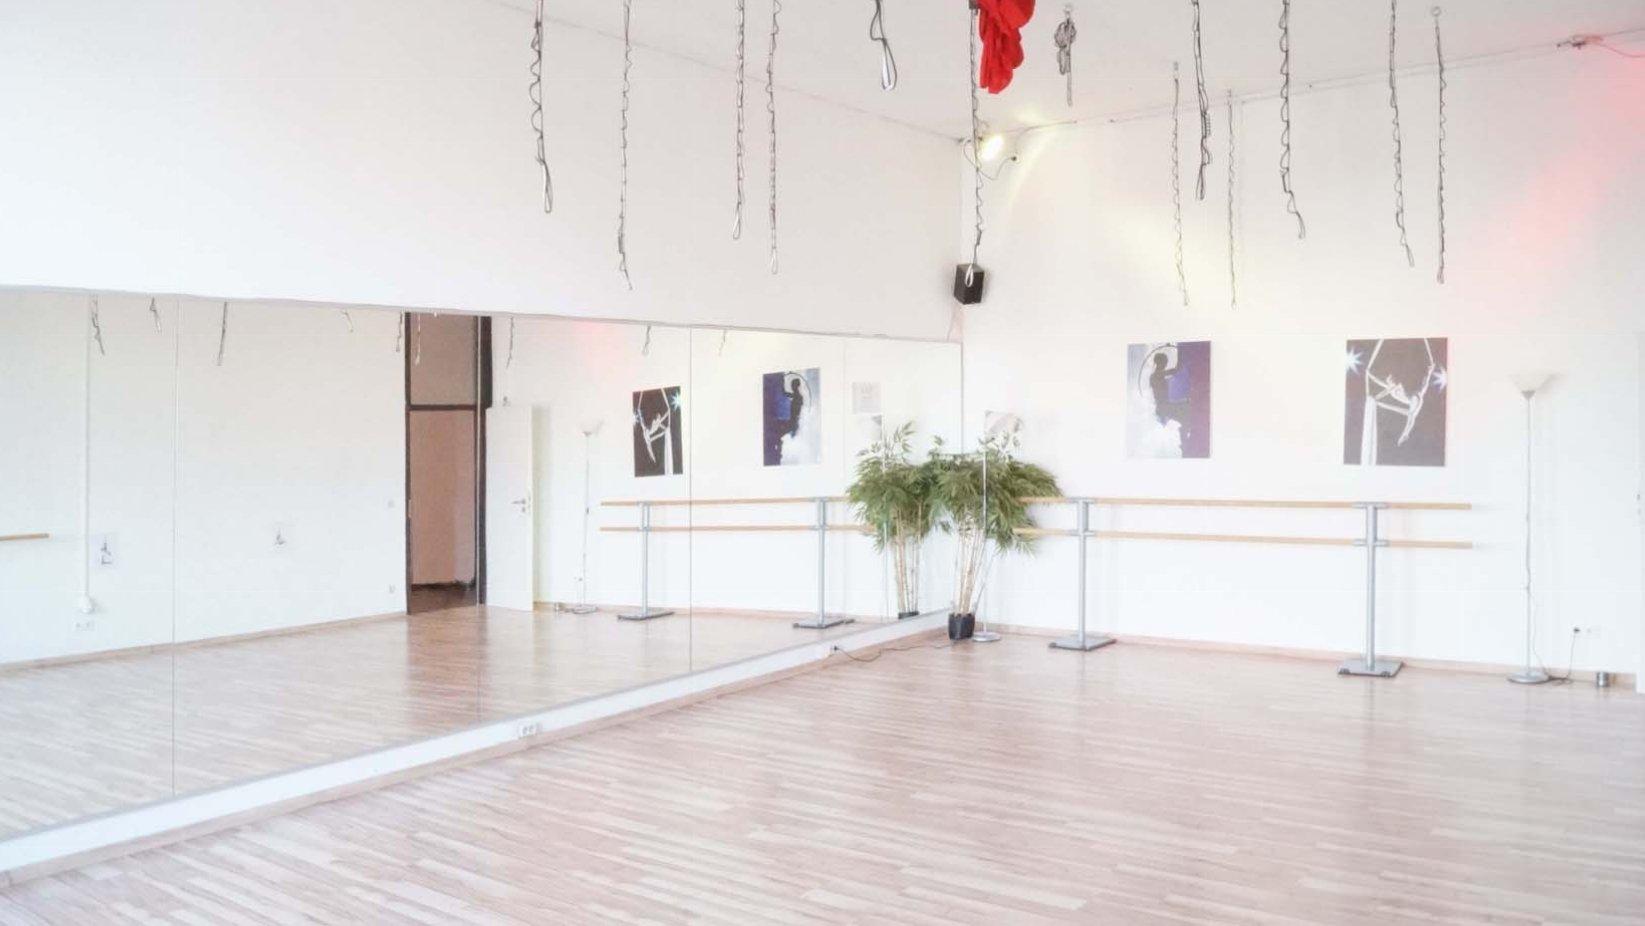 VI-Dance GmbH Studio Essen in 45143 Essen